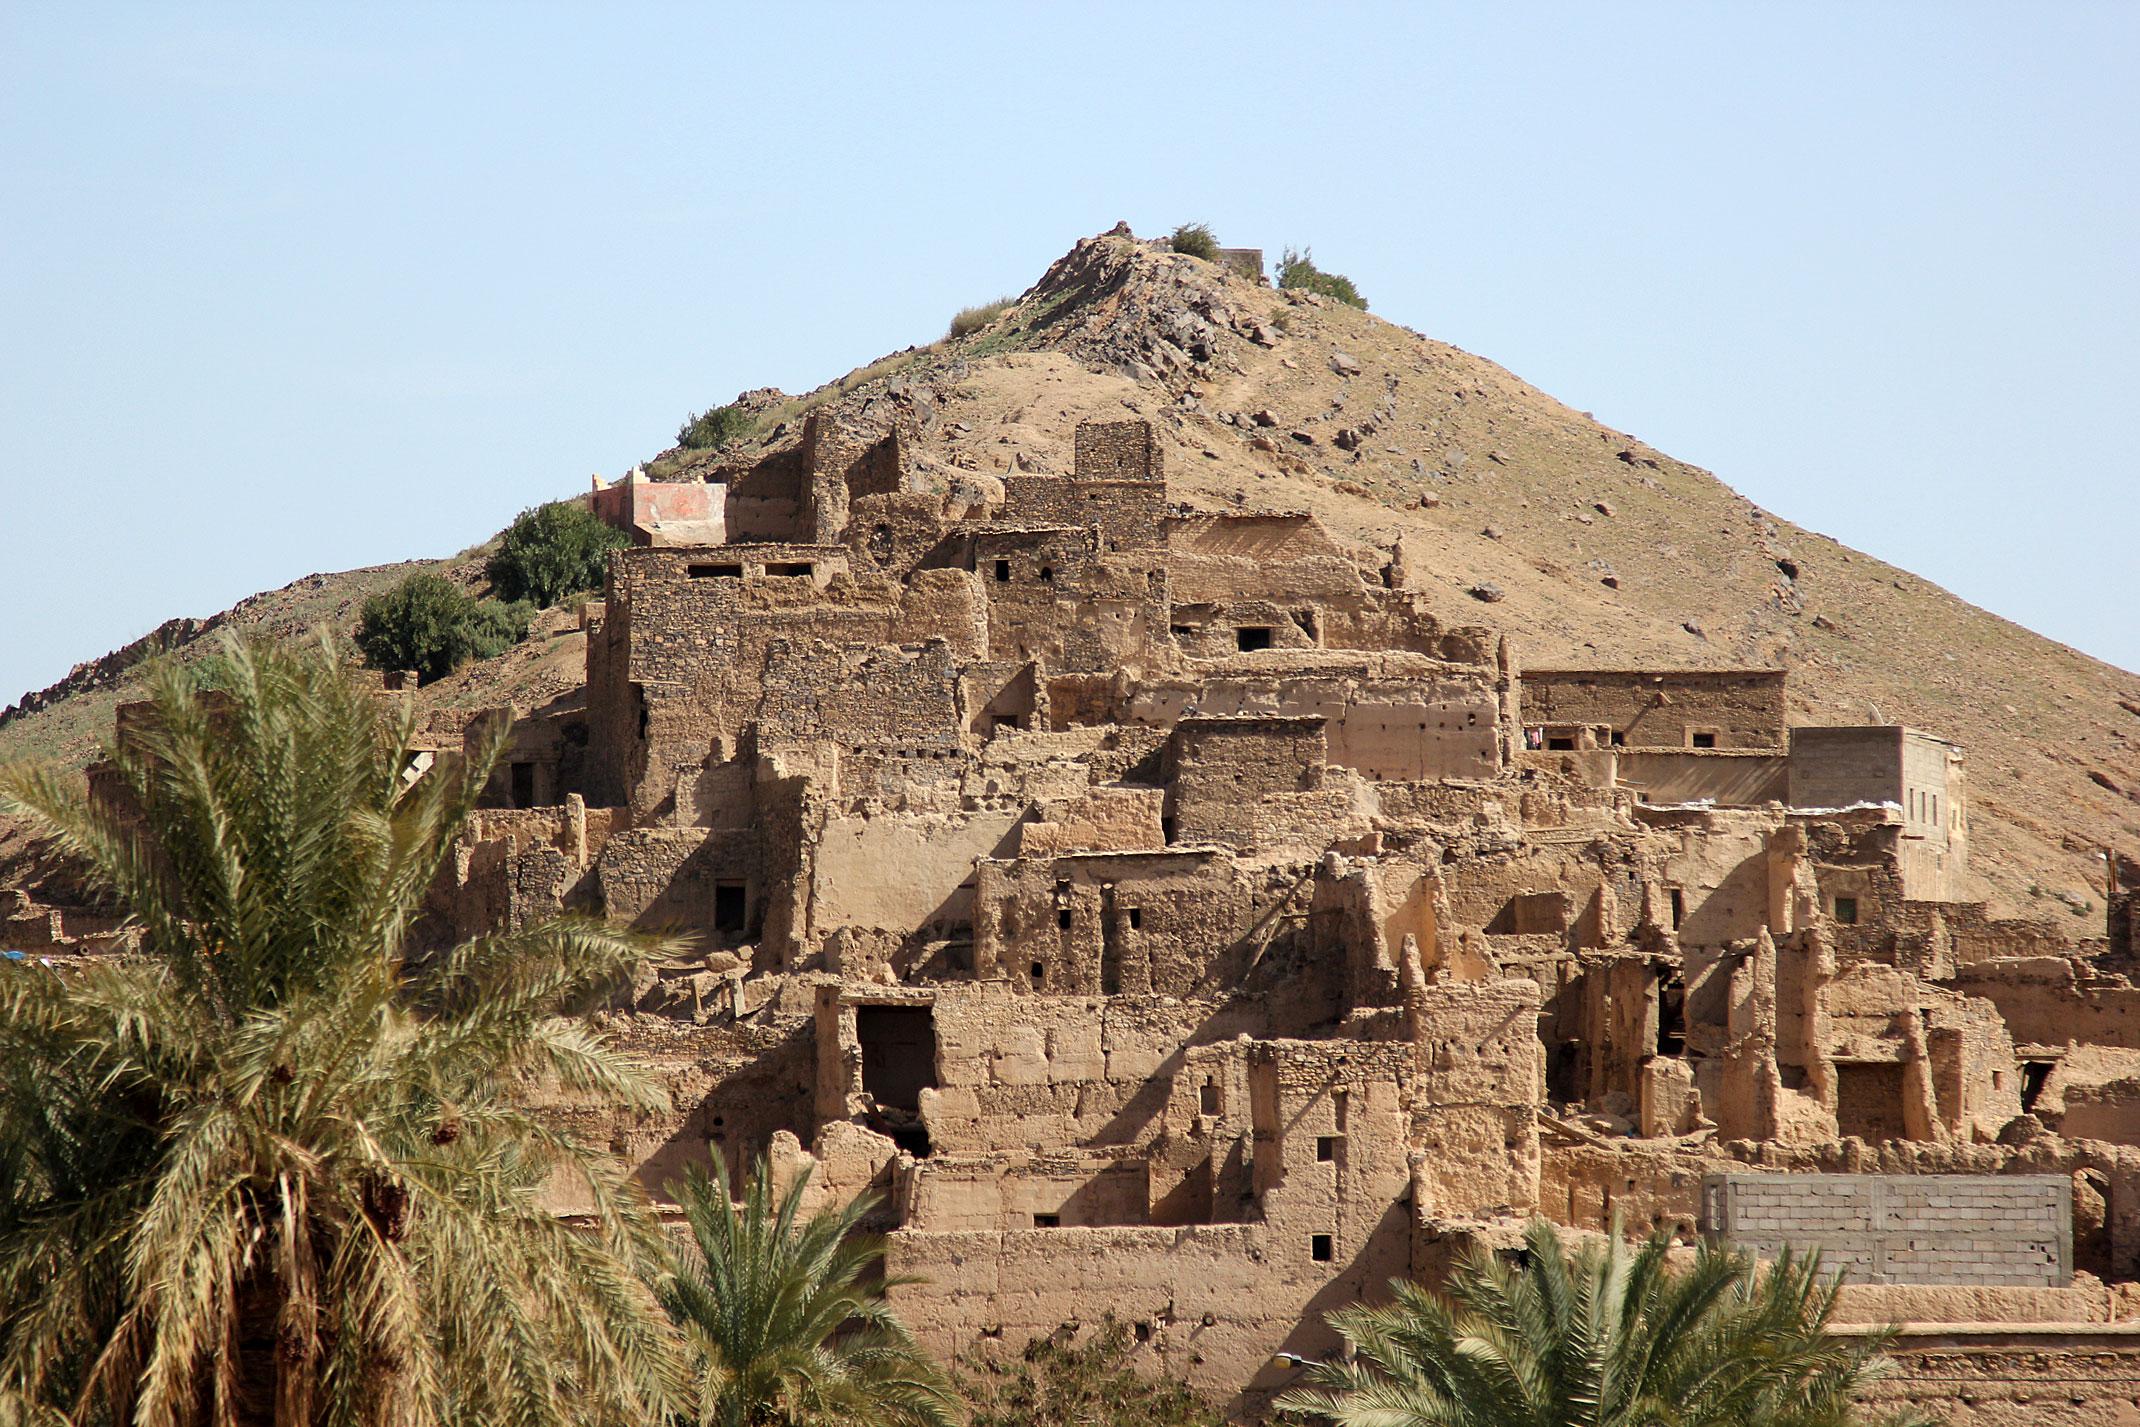 Maroko.Stara kazba